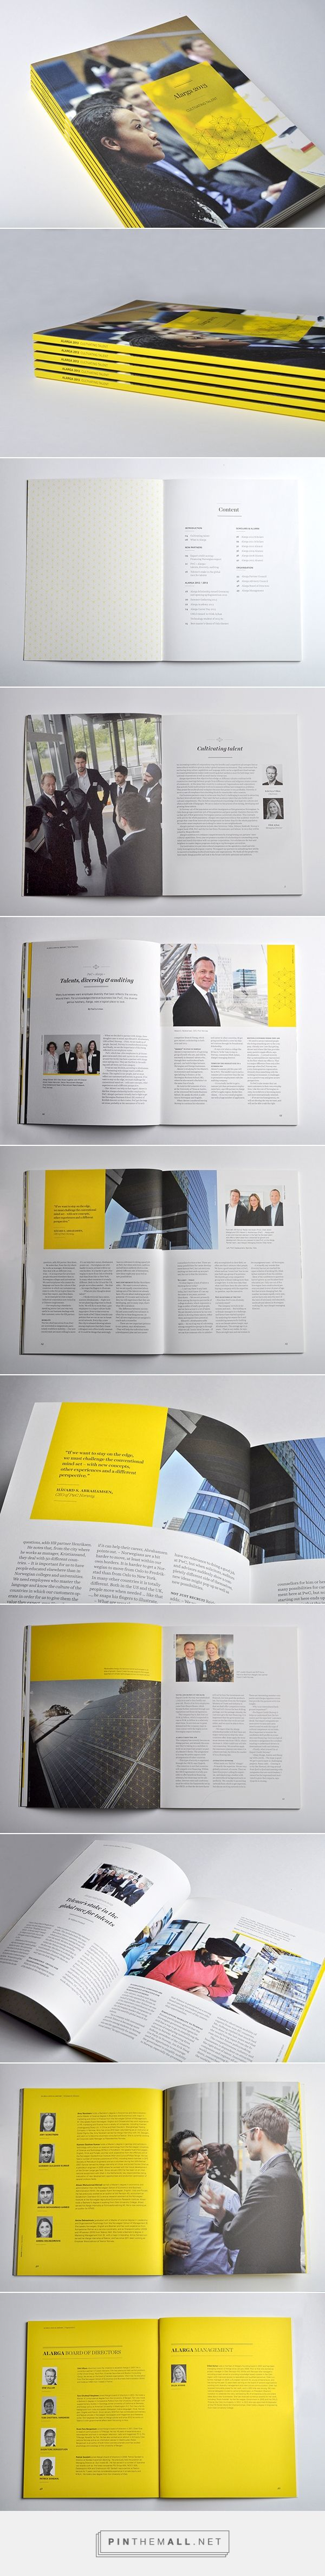 Alarga 2013 by Awchat & Olsen Design